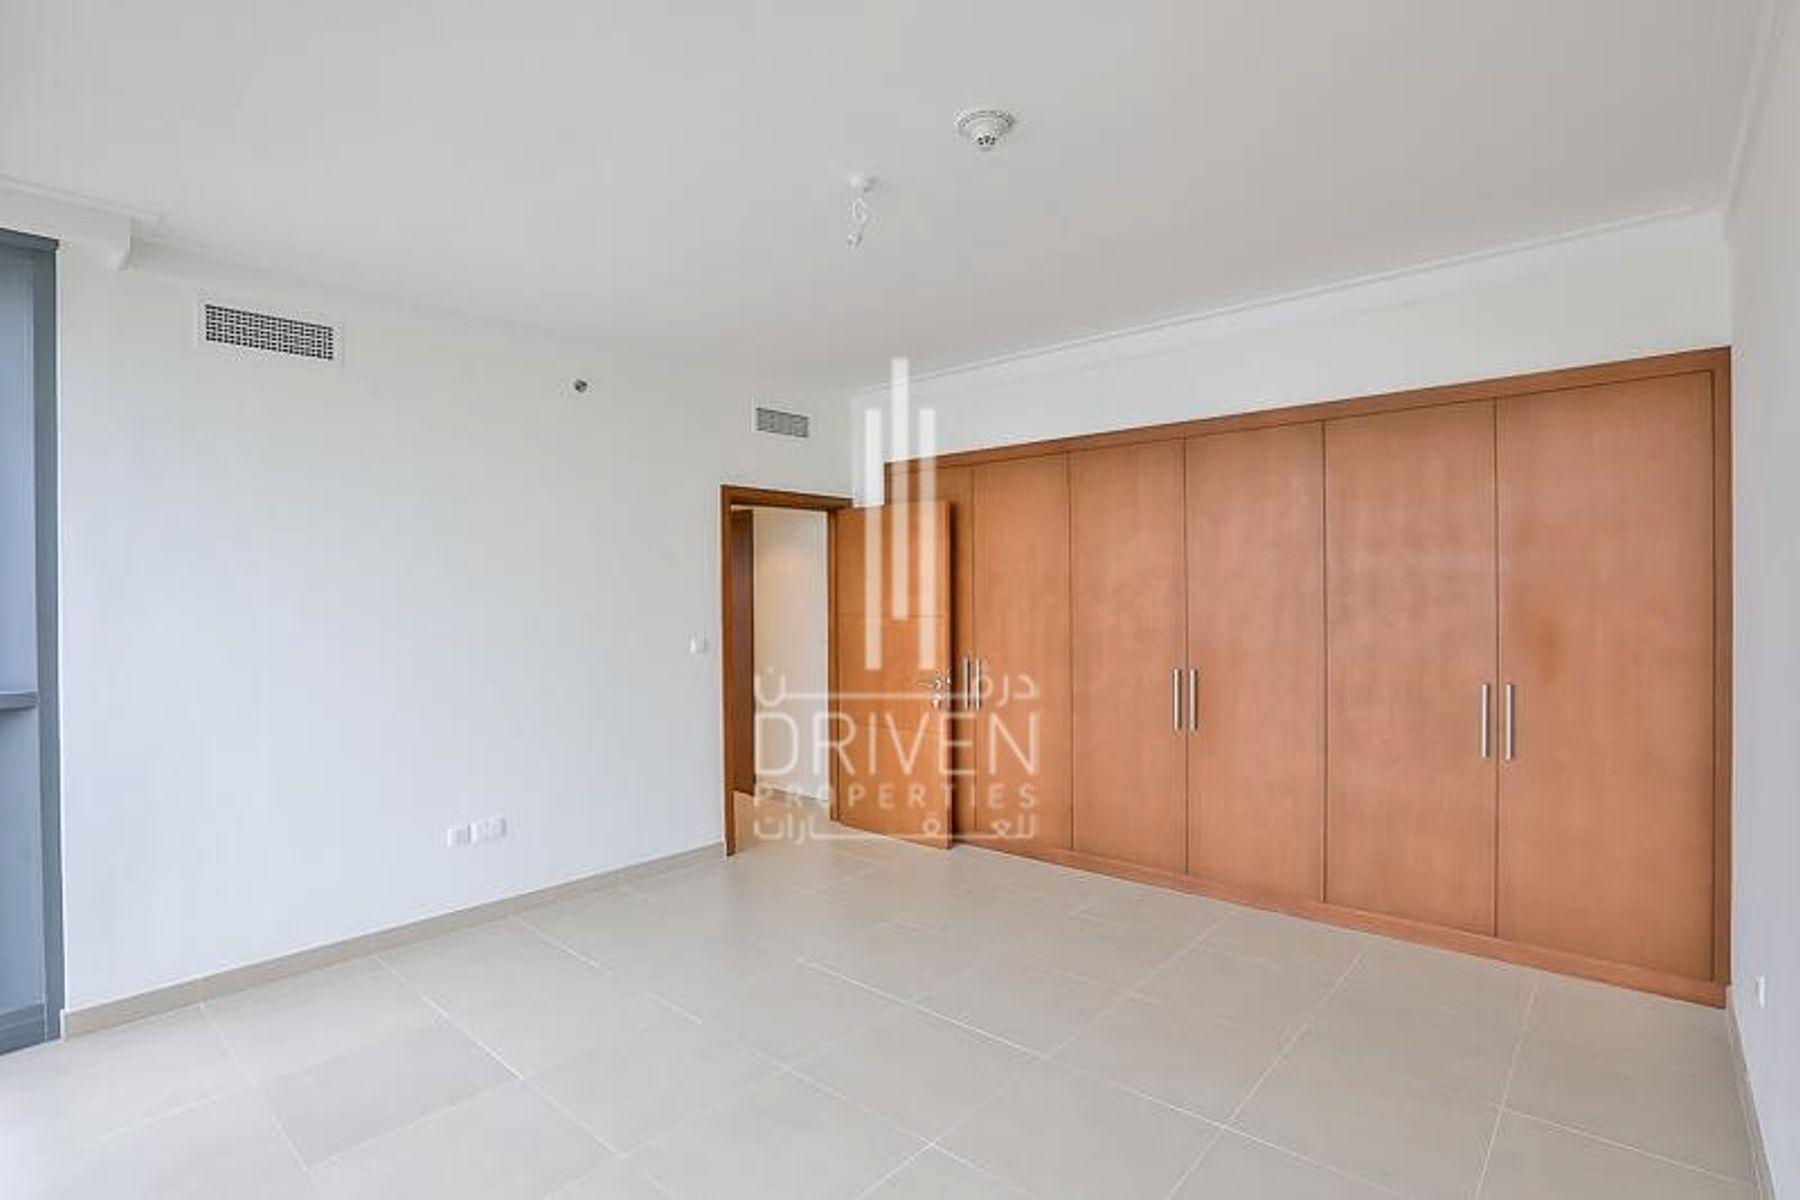 Apartment for Sale in Dubai Creek Residence Tower 2 South - Dubai Creek Harbour